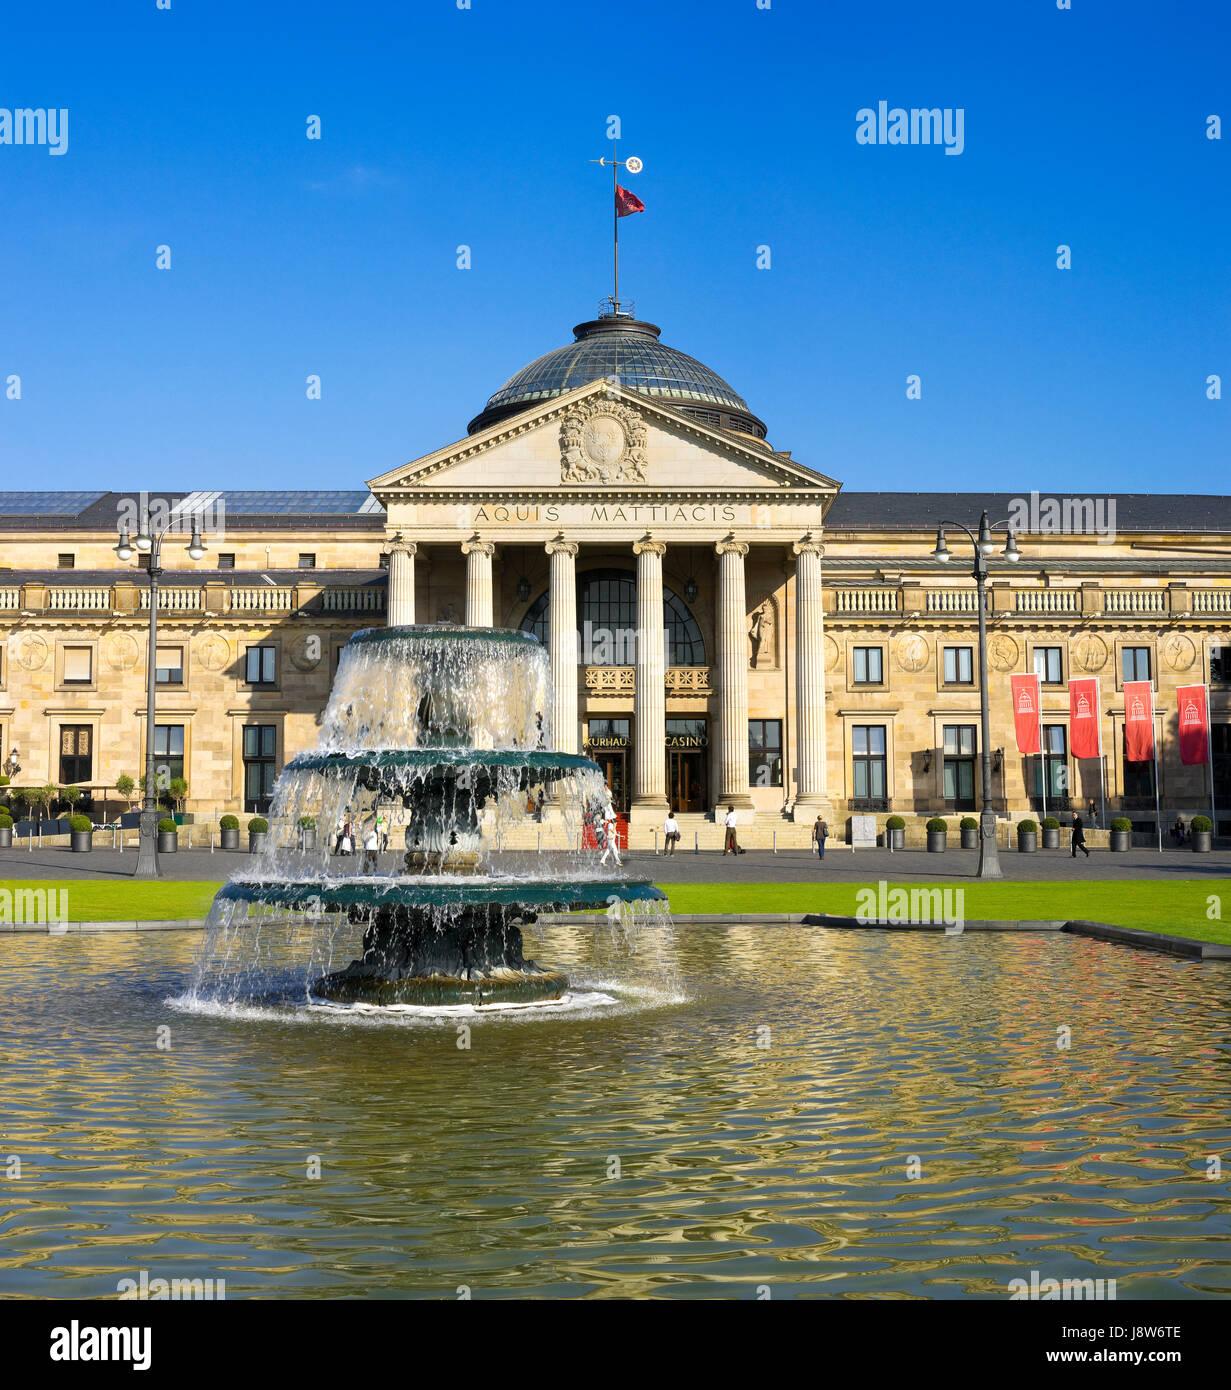 kurhaus, shine, shines, bright, lucent, light, serene, luminous, park, dome, - Stock Image